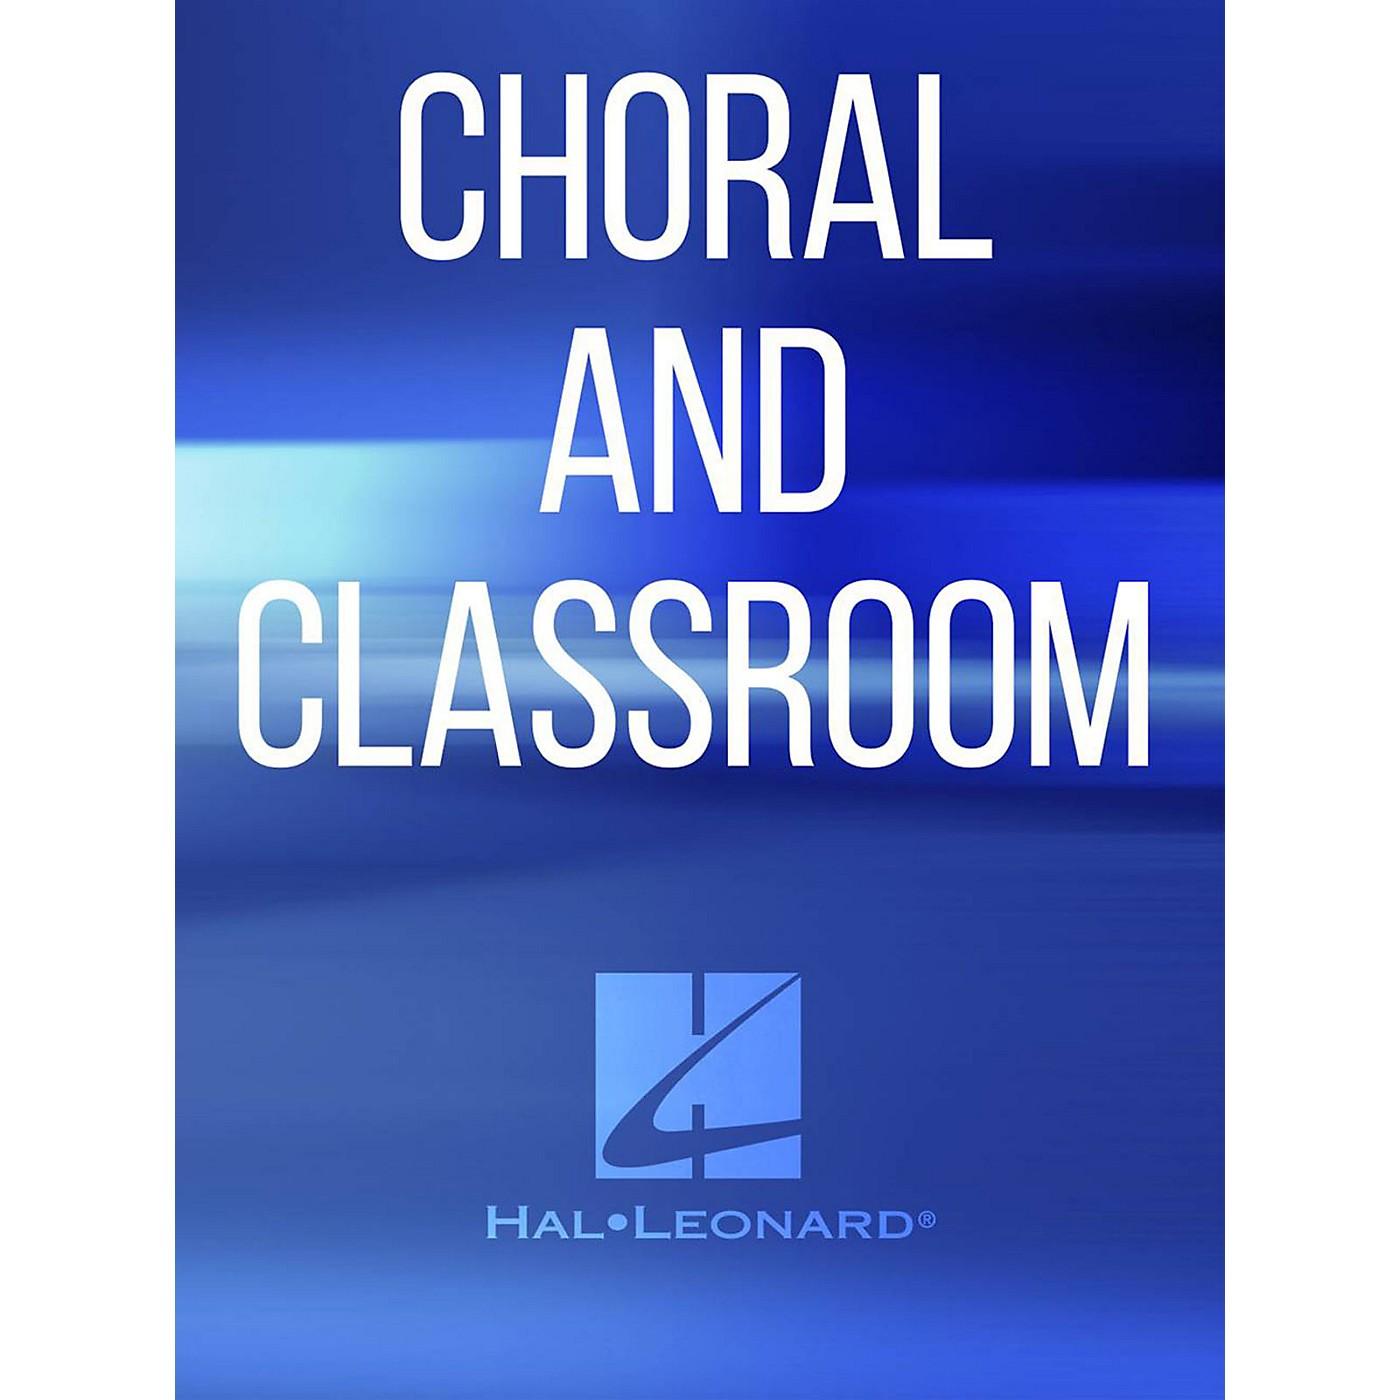 Hal Leonard When The Ear Heard Her SATB Composed by Jay Crenshaw Decker thumbnail